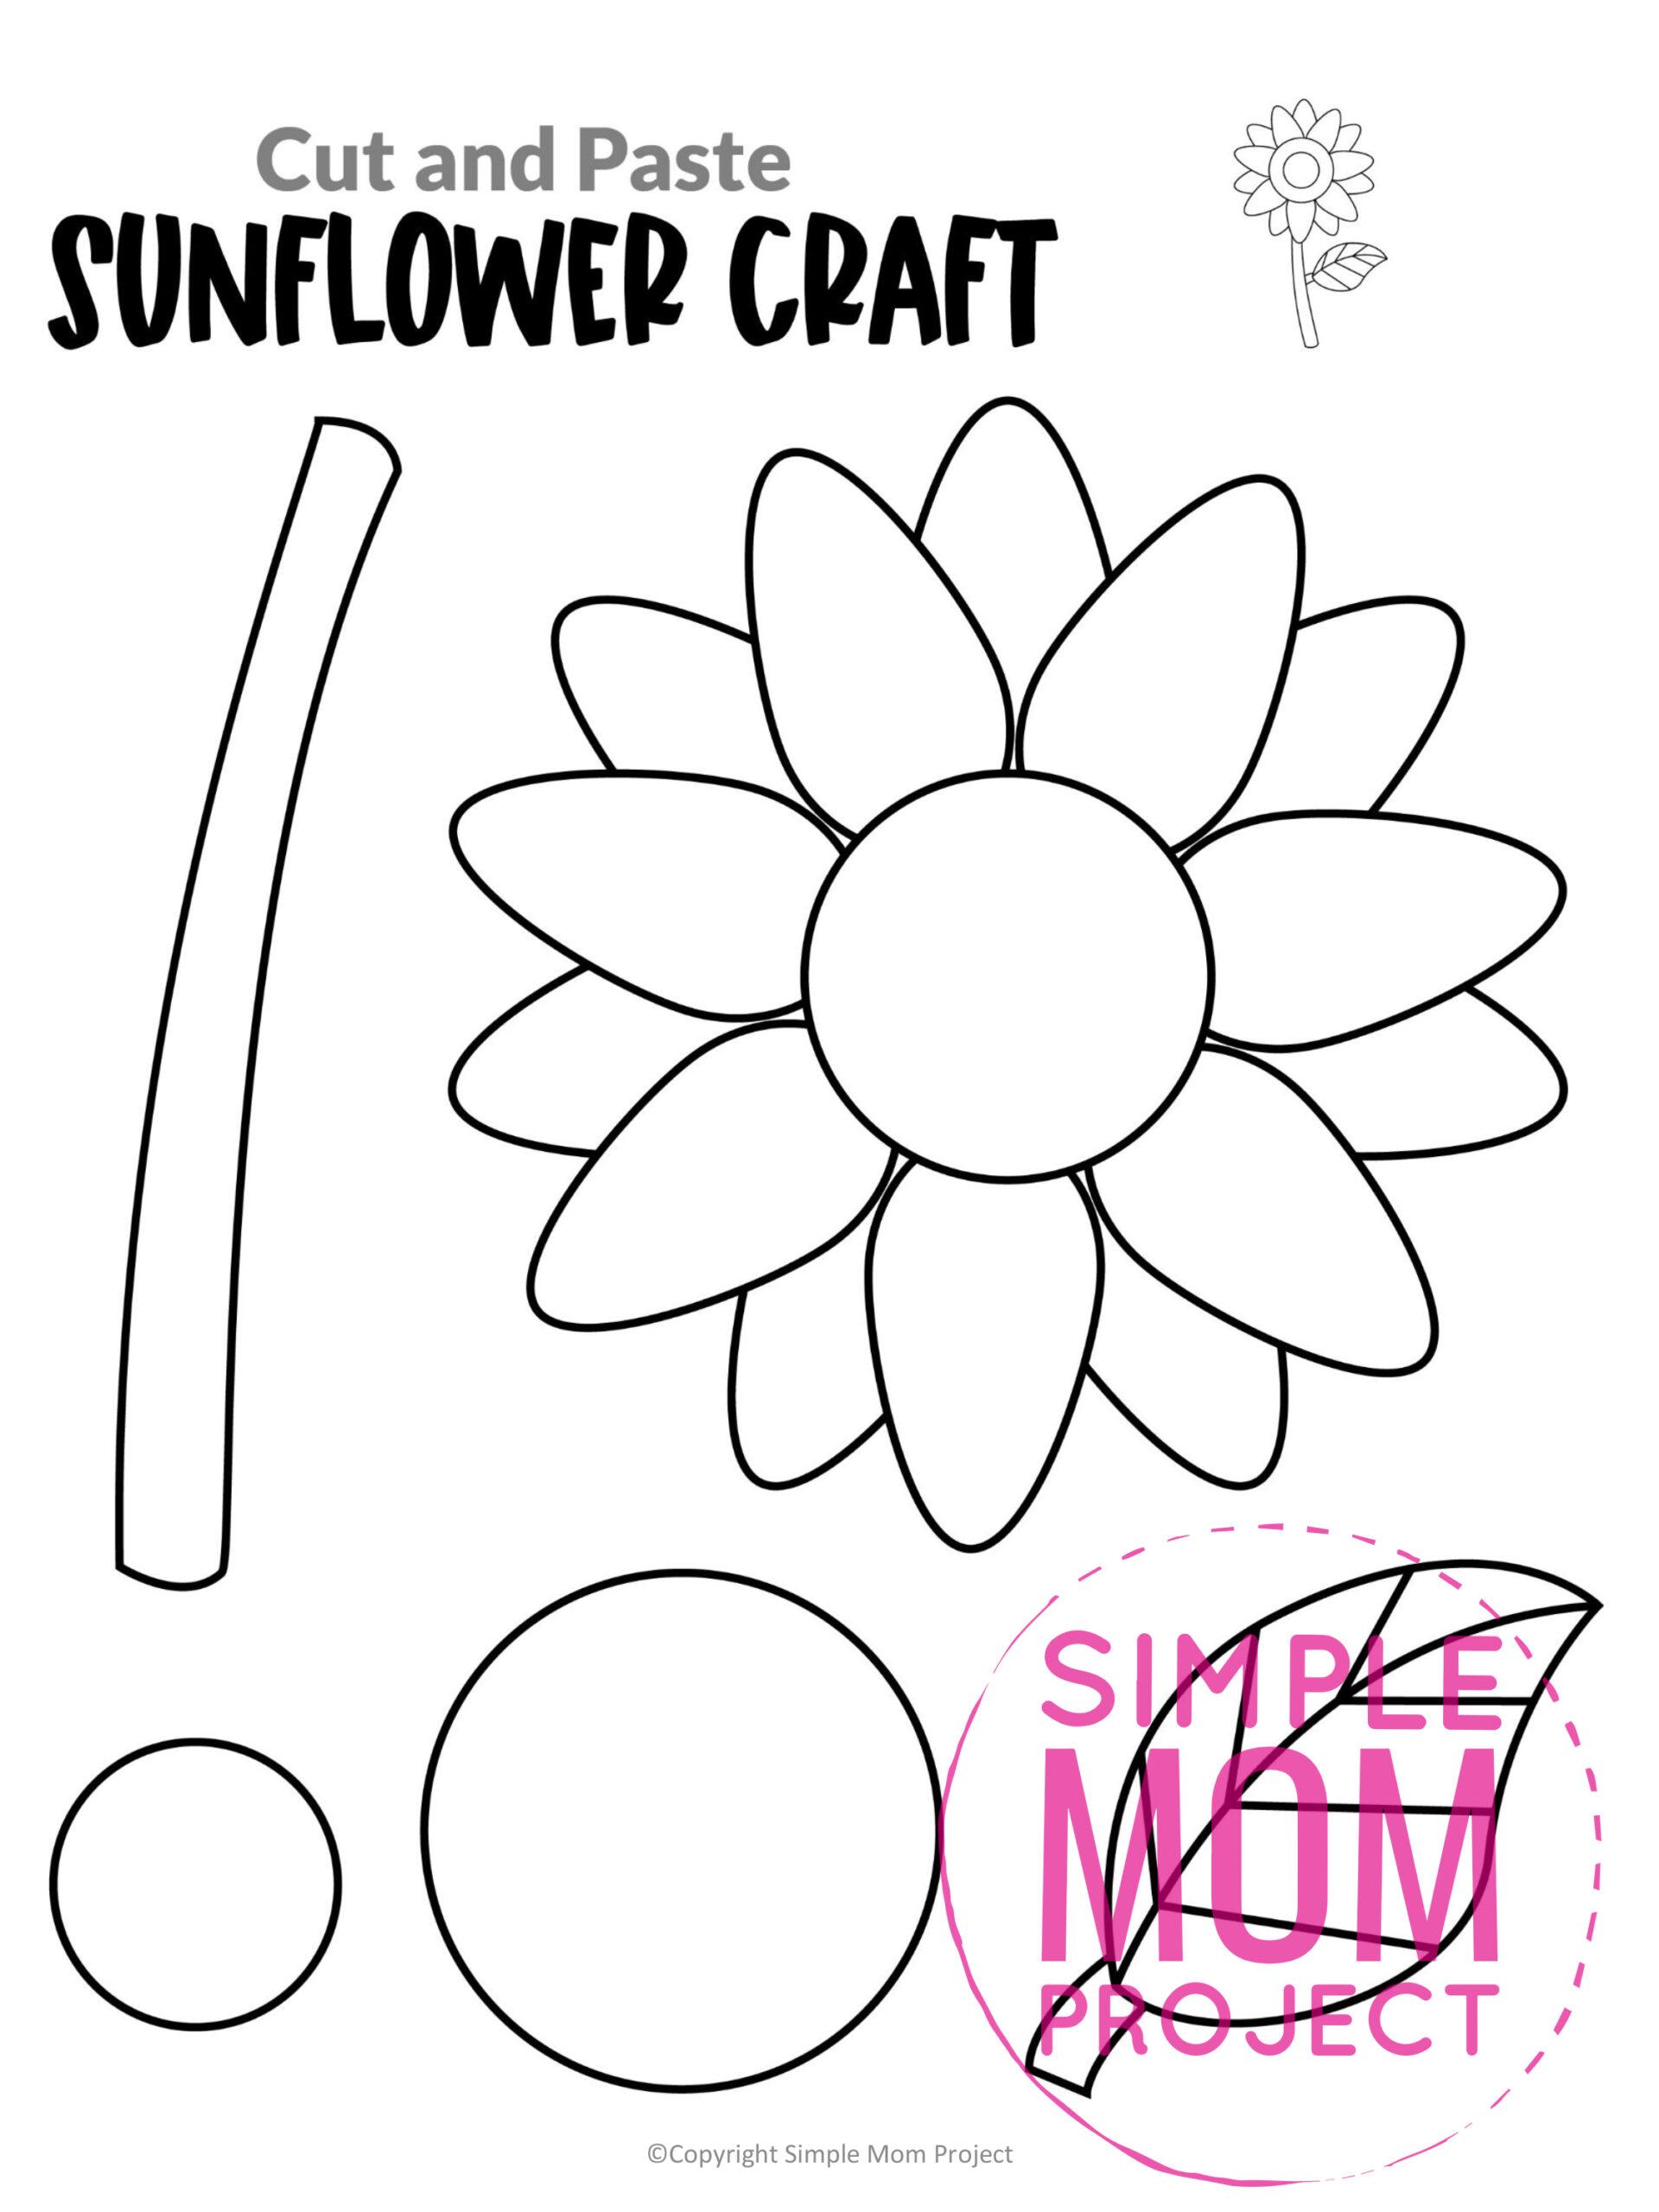 Printable Sunflower Flower Craft template for kids, Sunflower craft for toddlers and Sunflower craft for kindergartners